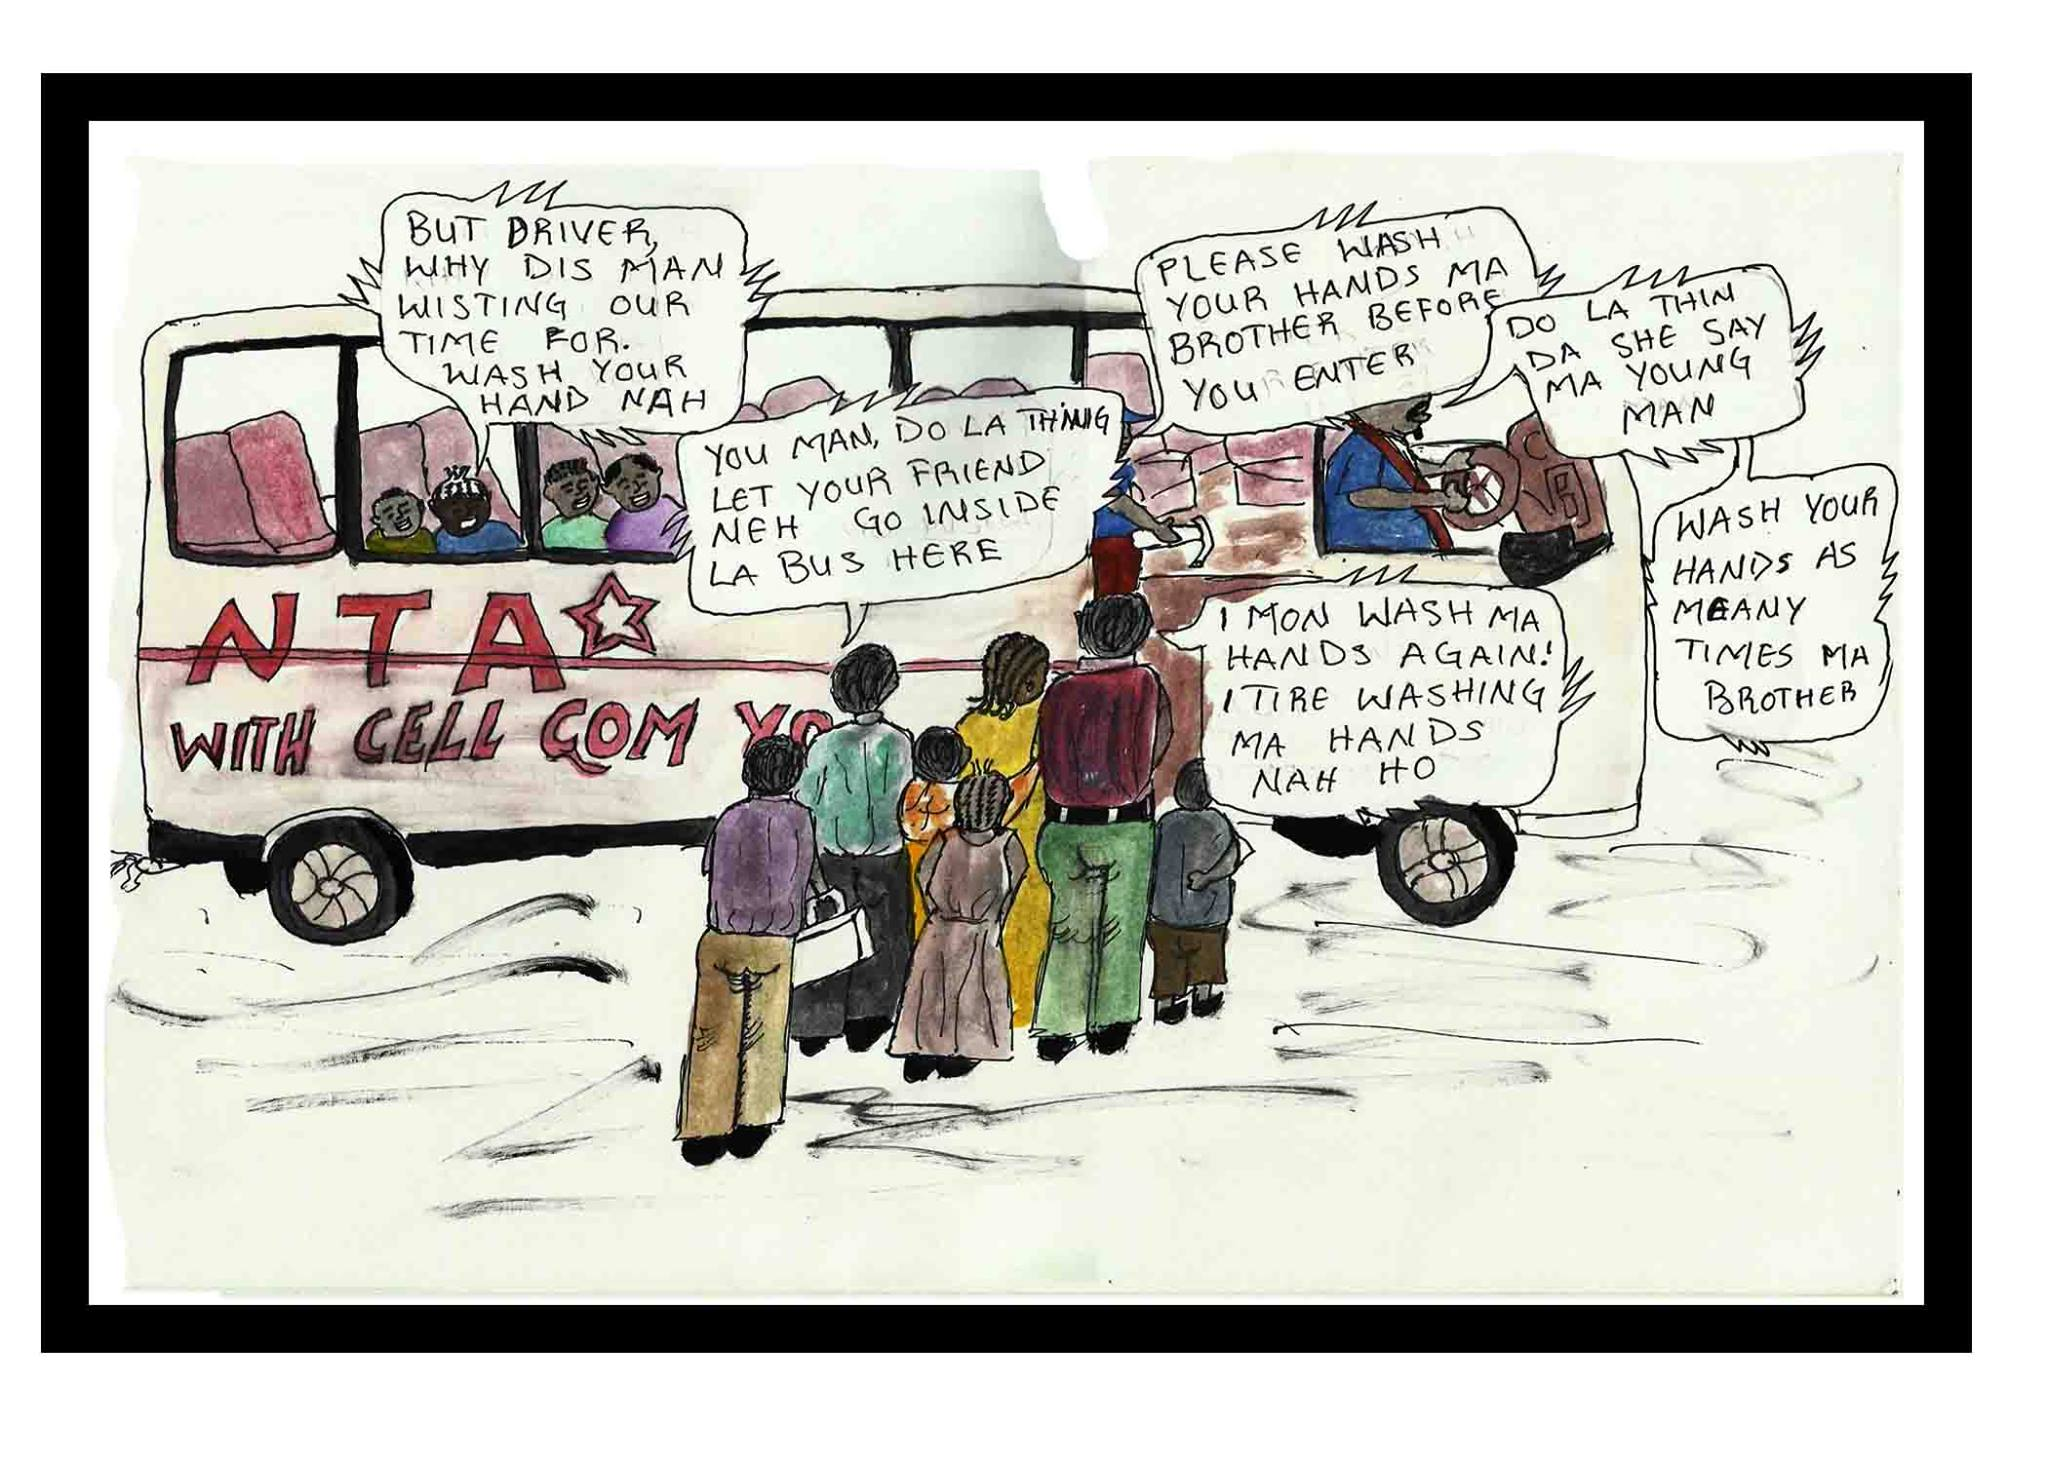 Youth artist j d depicts a public conversation about ebola